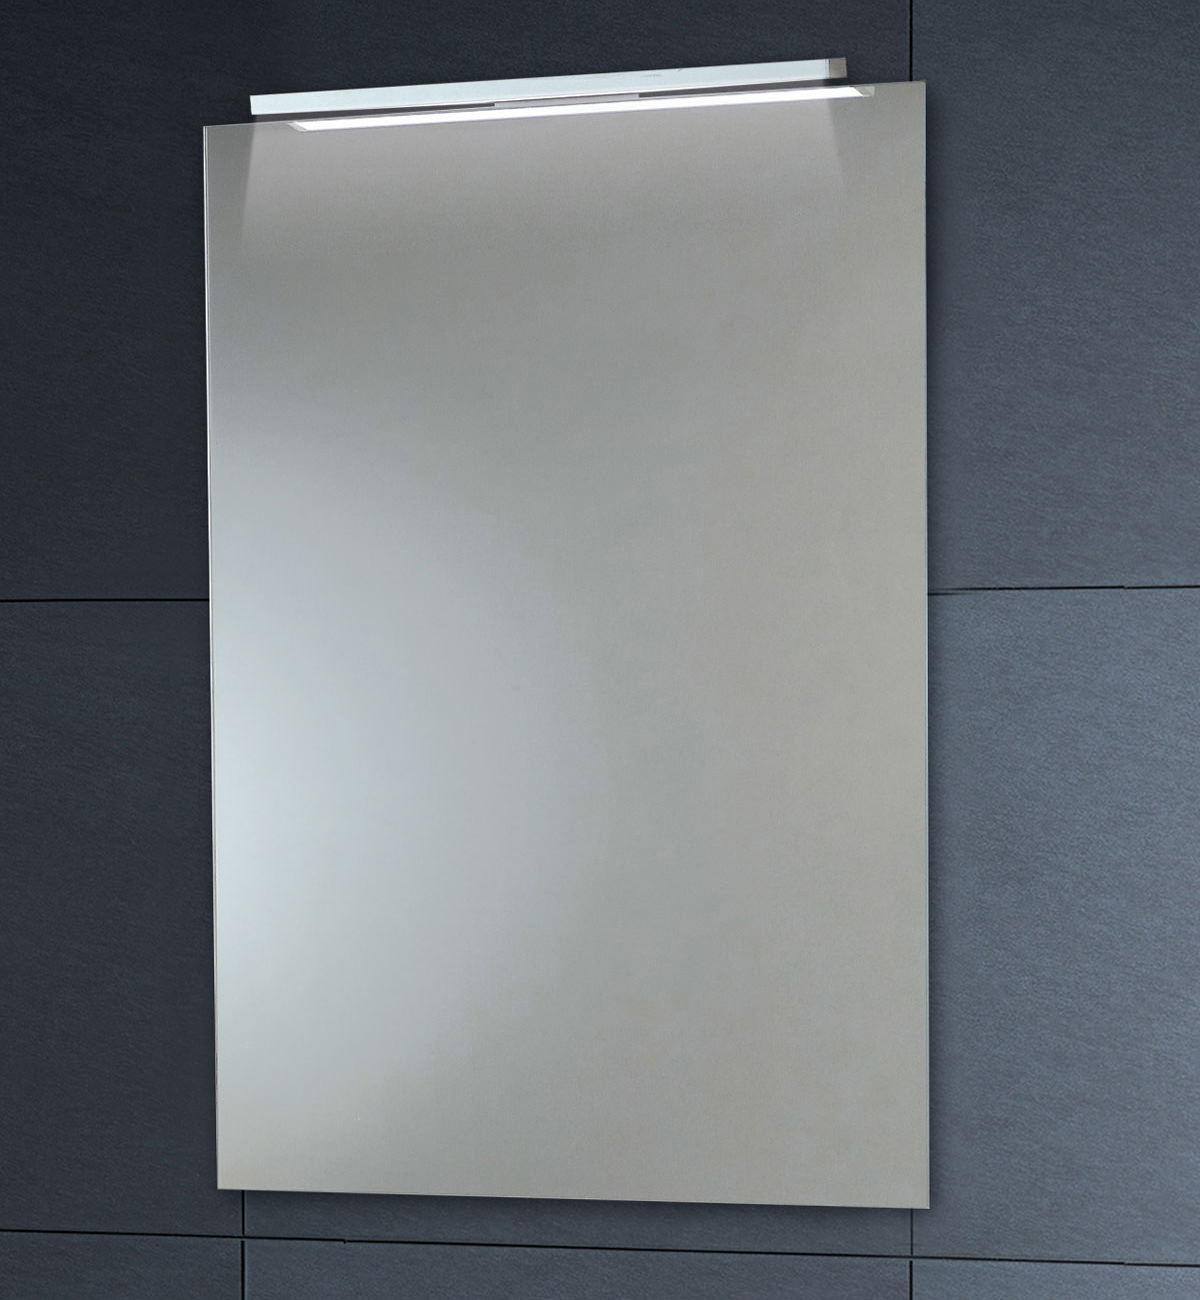 Bathroom Mirror Demister Down Lighter Mirror With Demister Pad 450 X 600mm Mi022